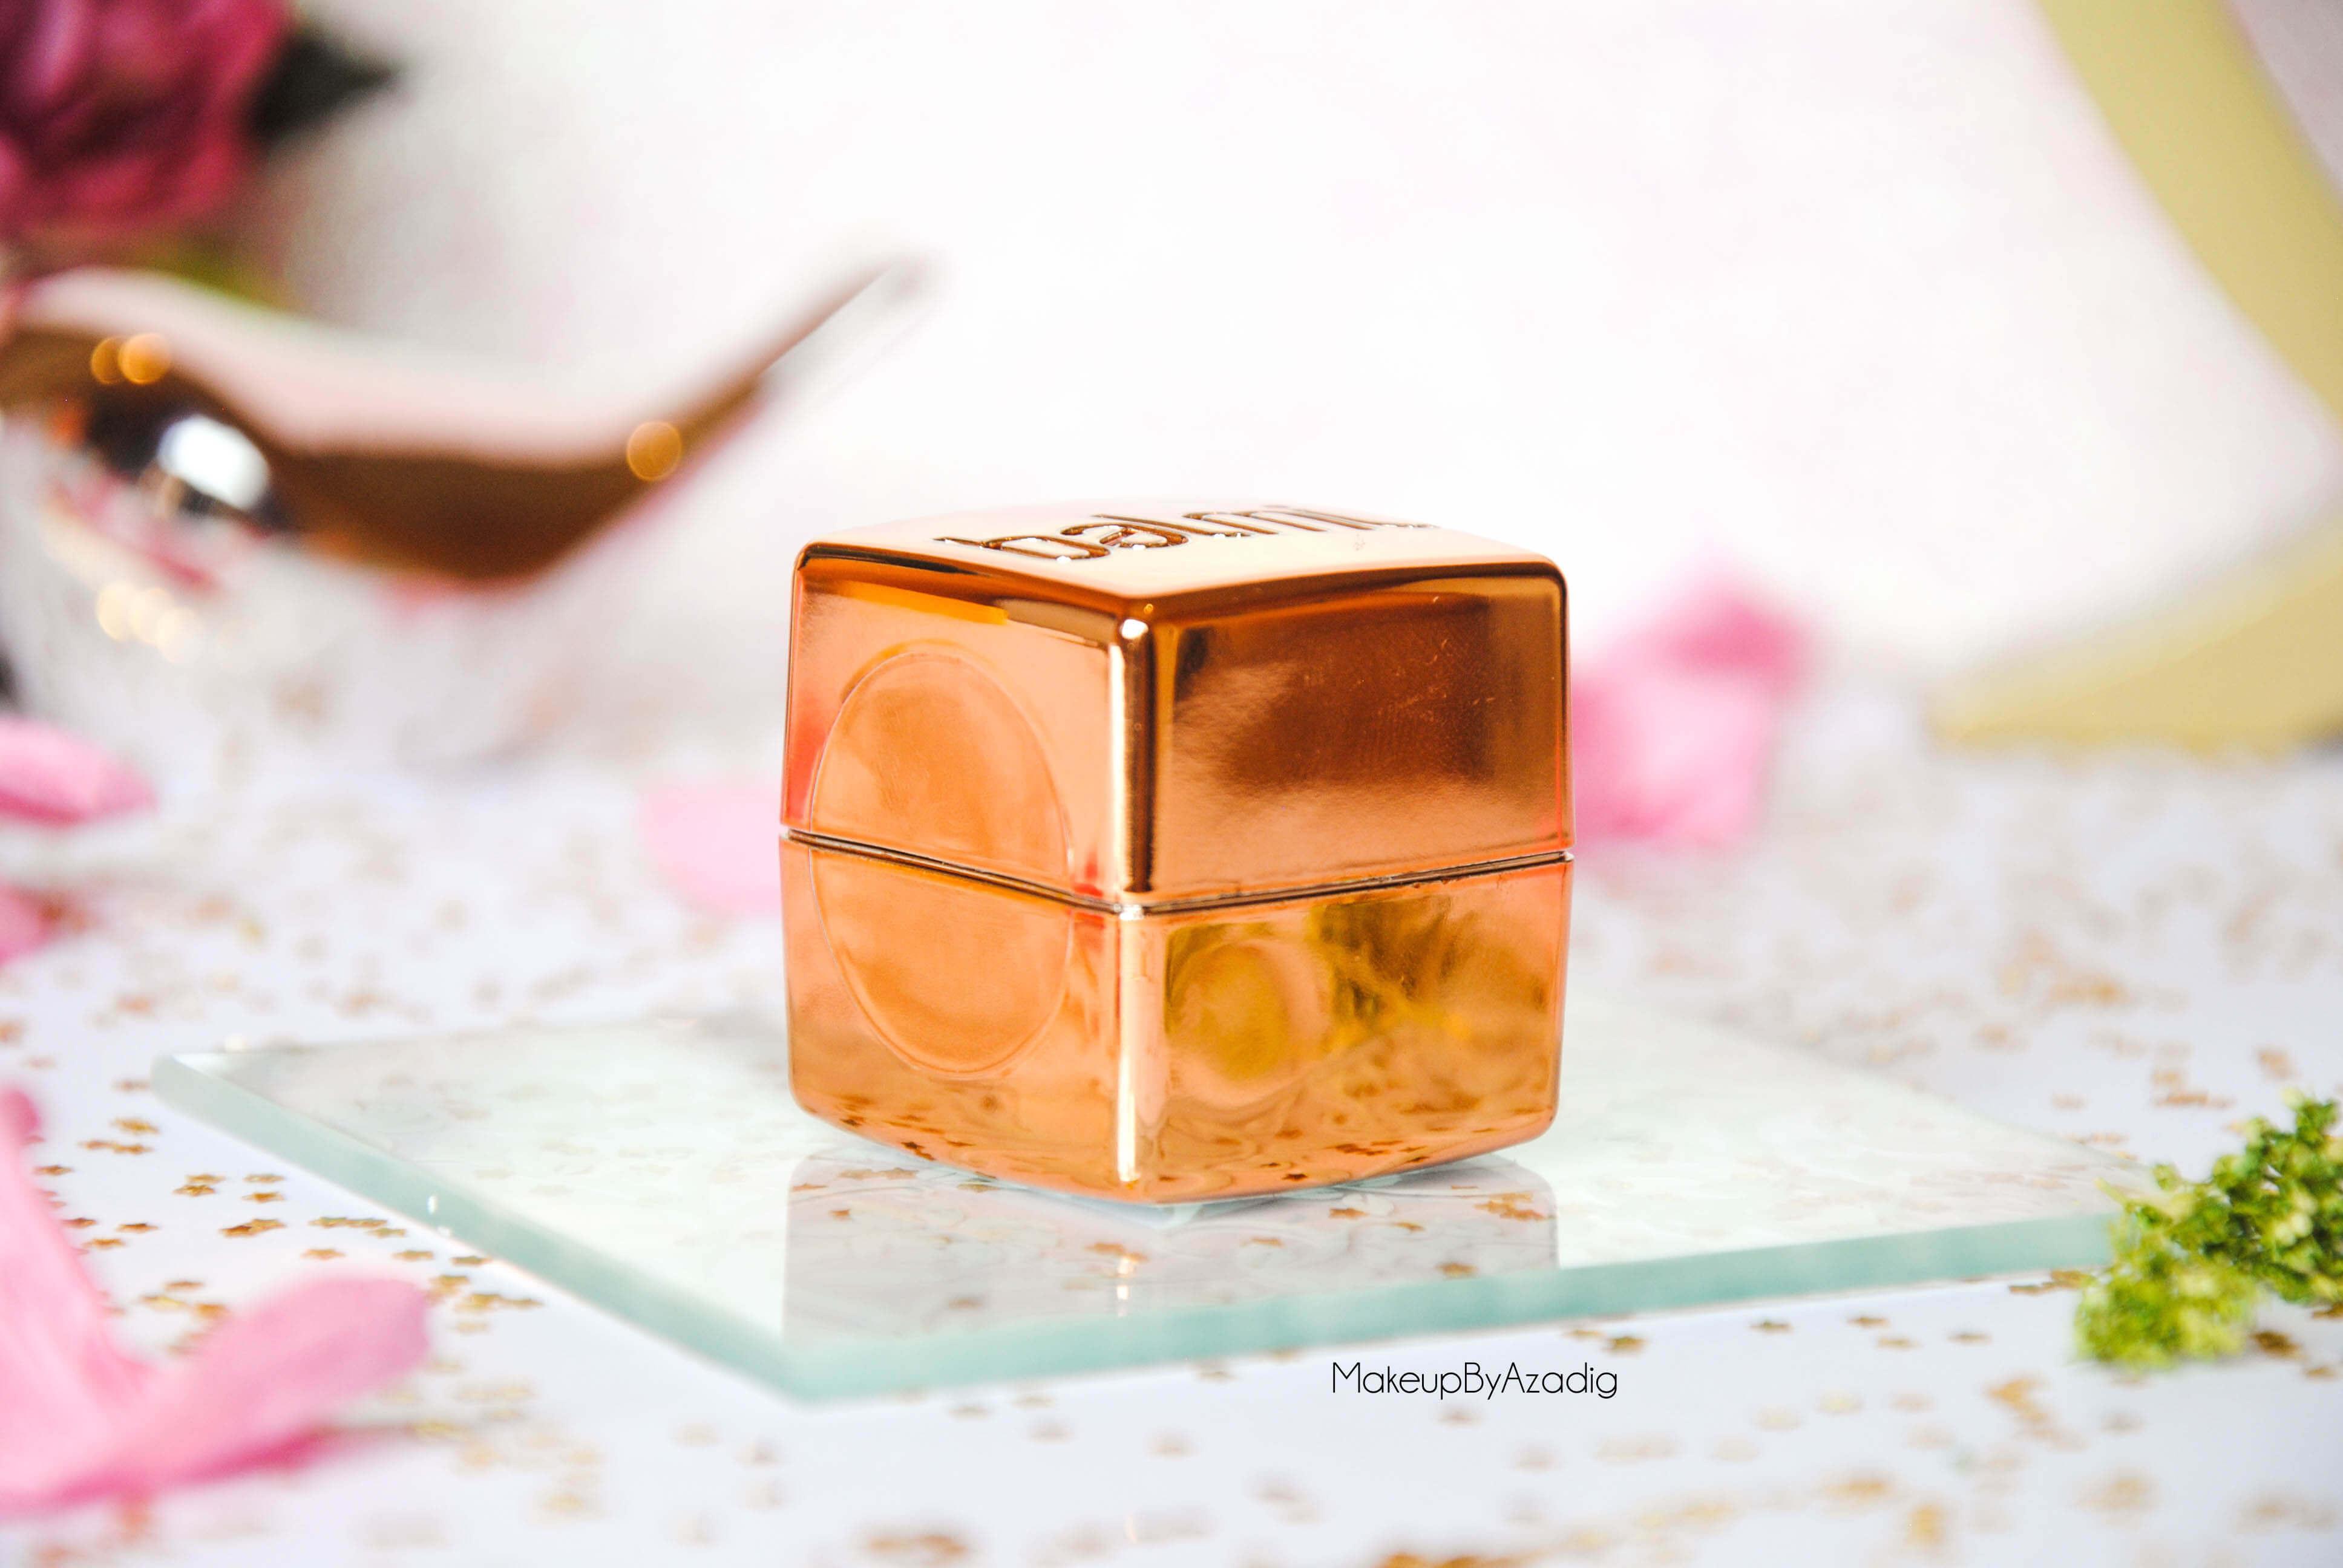 makeupbyazadig-baume-levres-balmi-roseberry-menthe-coco-fraise-beaute-privee-revue-review-troyes-dijon-cube